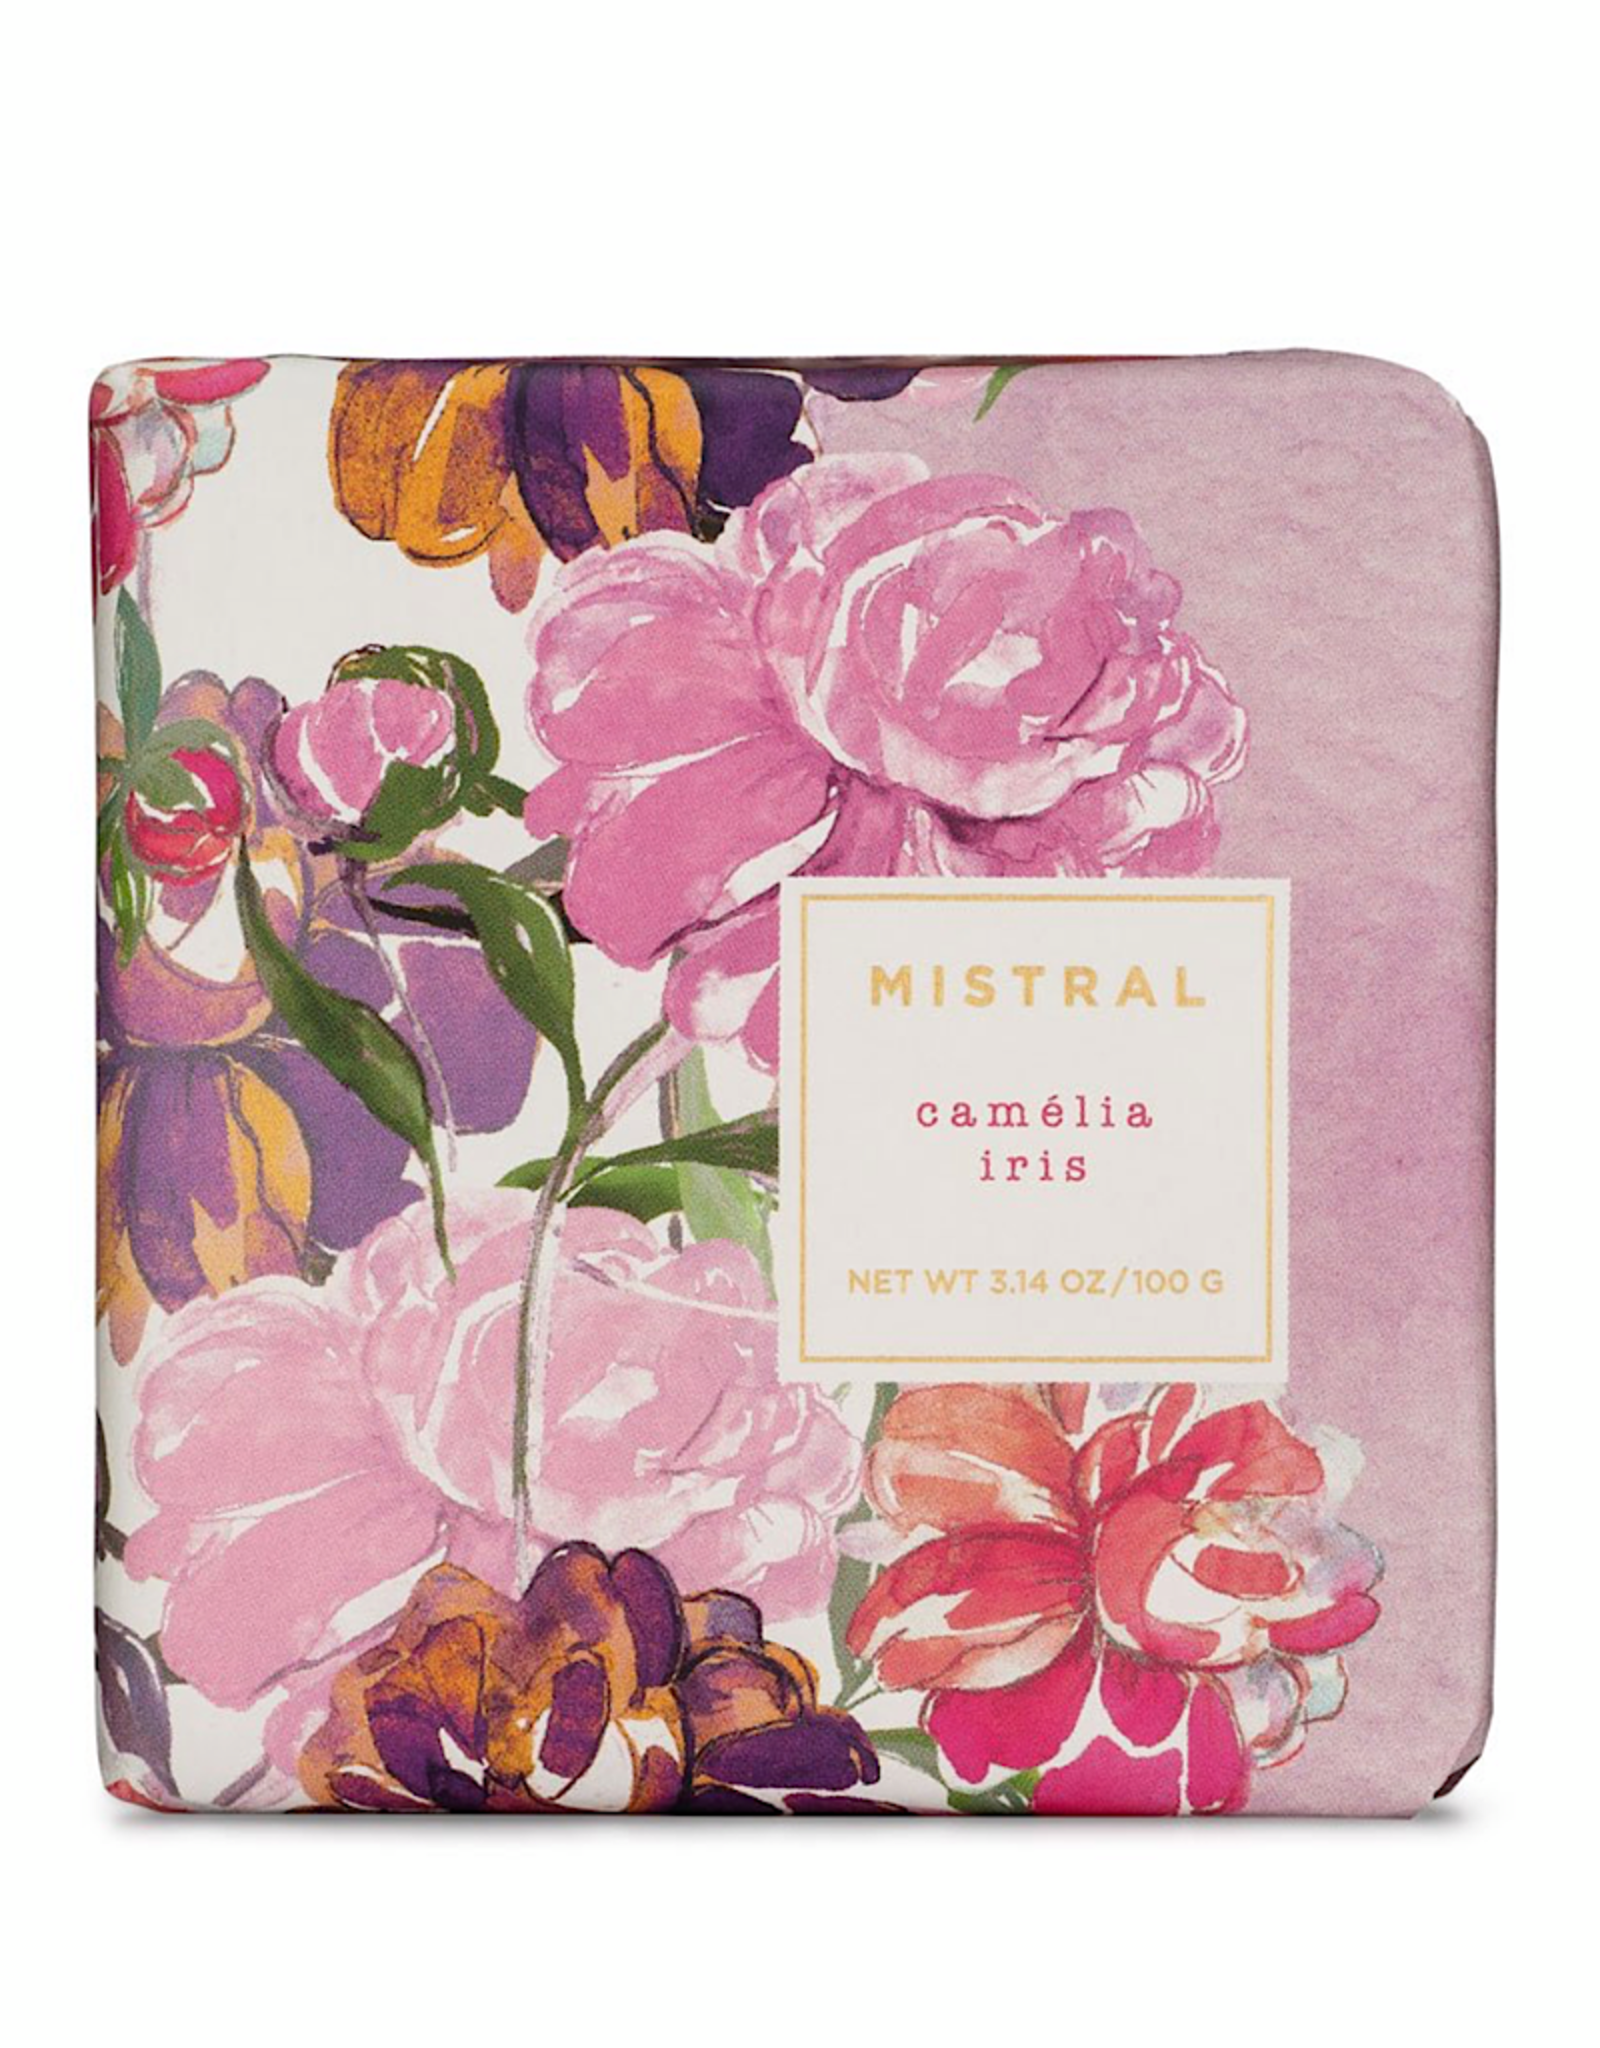 Mistral 100g Soap Exquisite Florals Bar